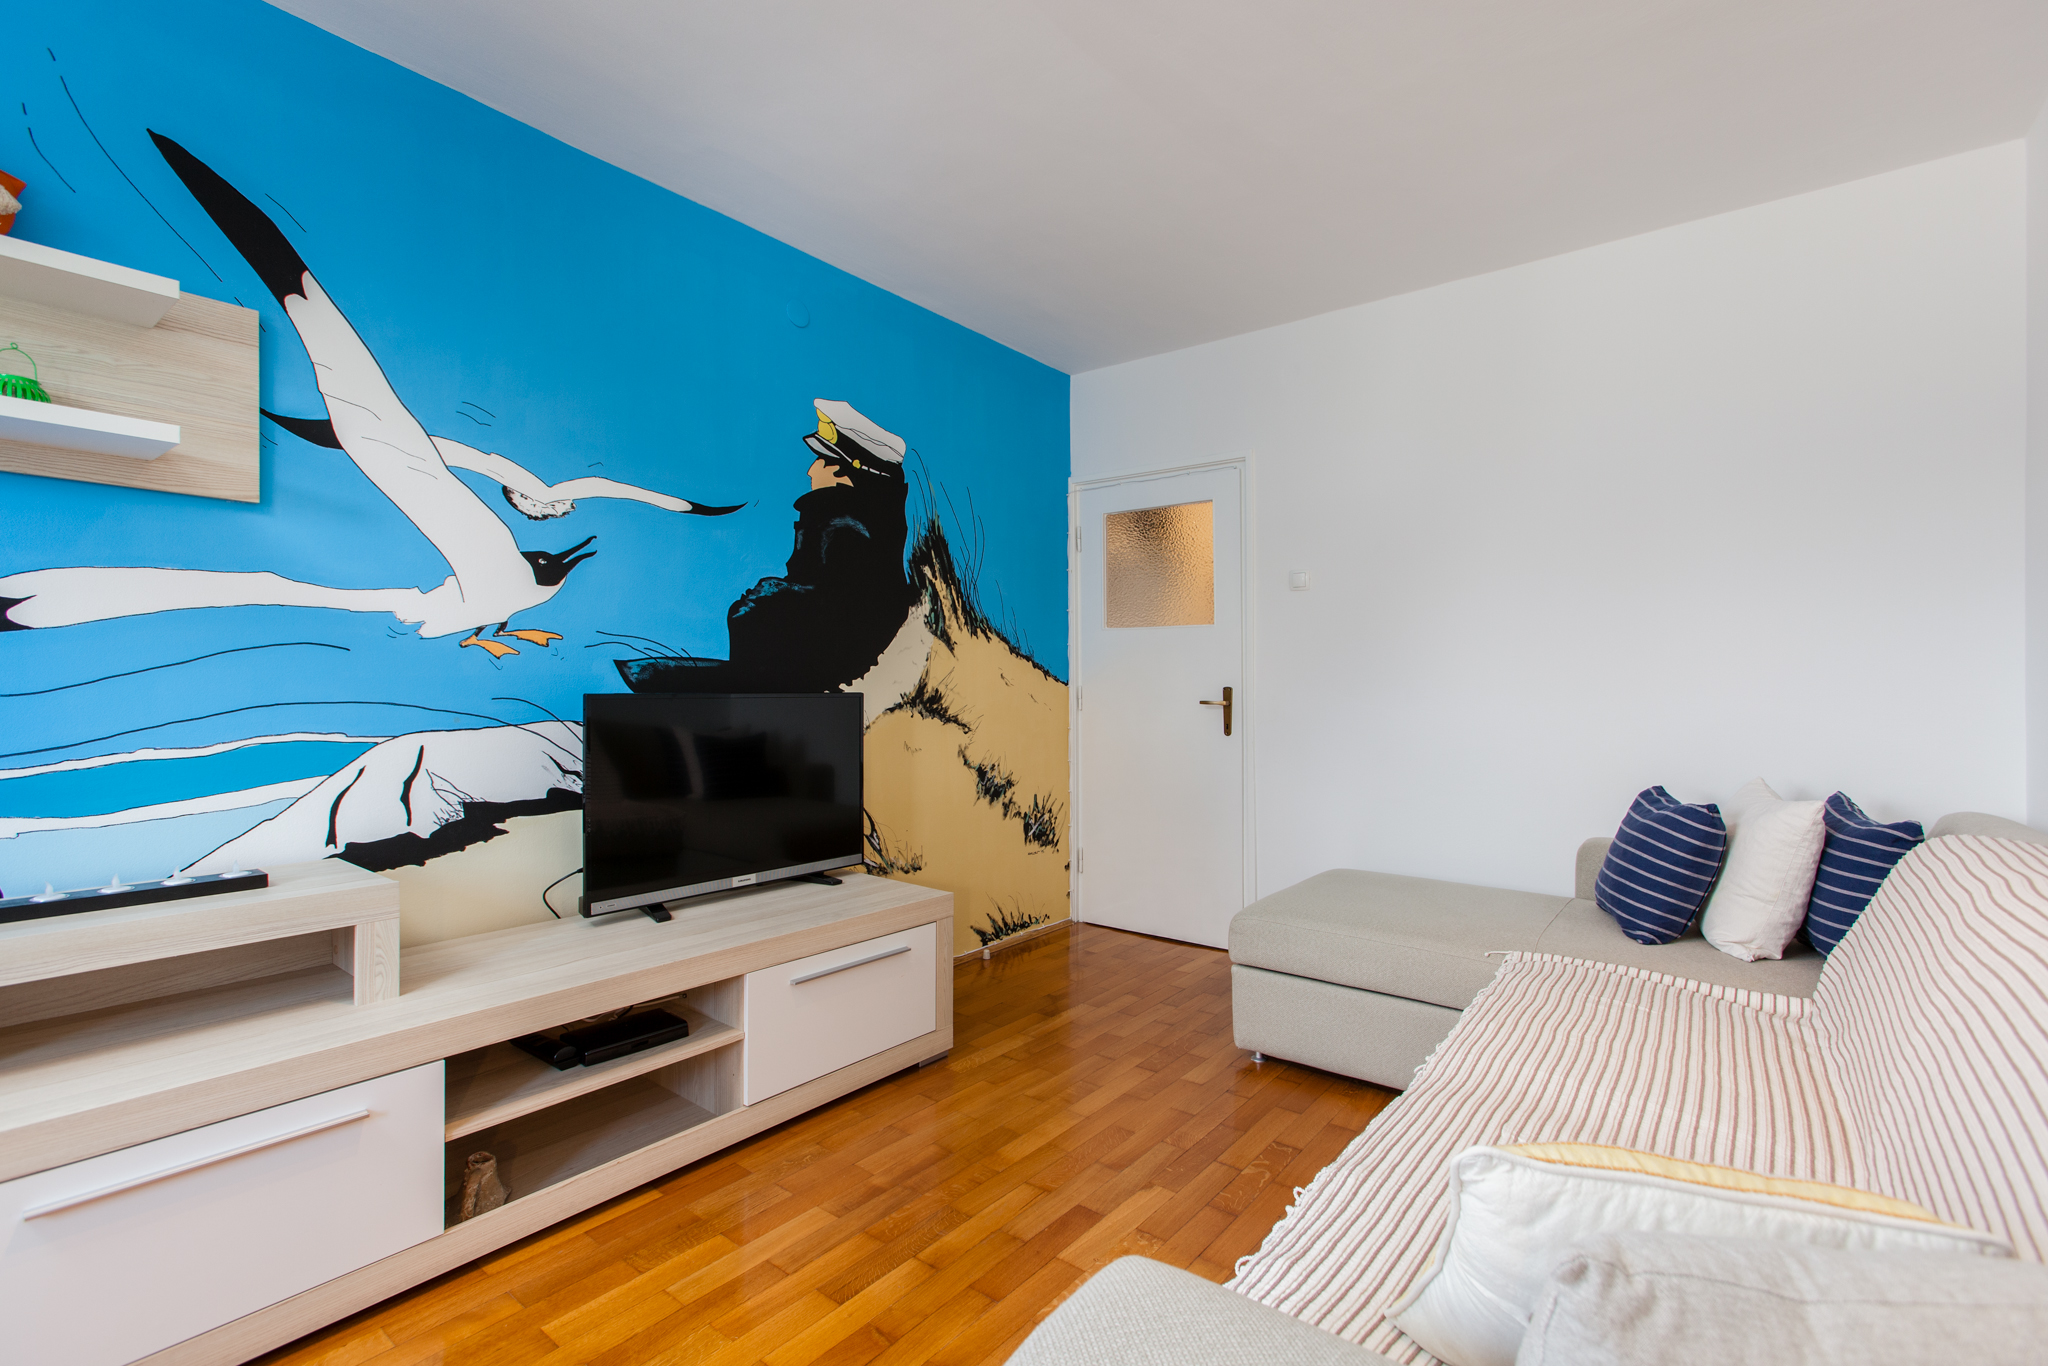 Apartment Split - Corto Maltese (9)